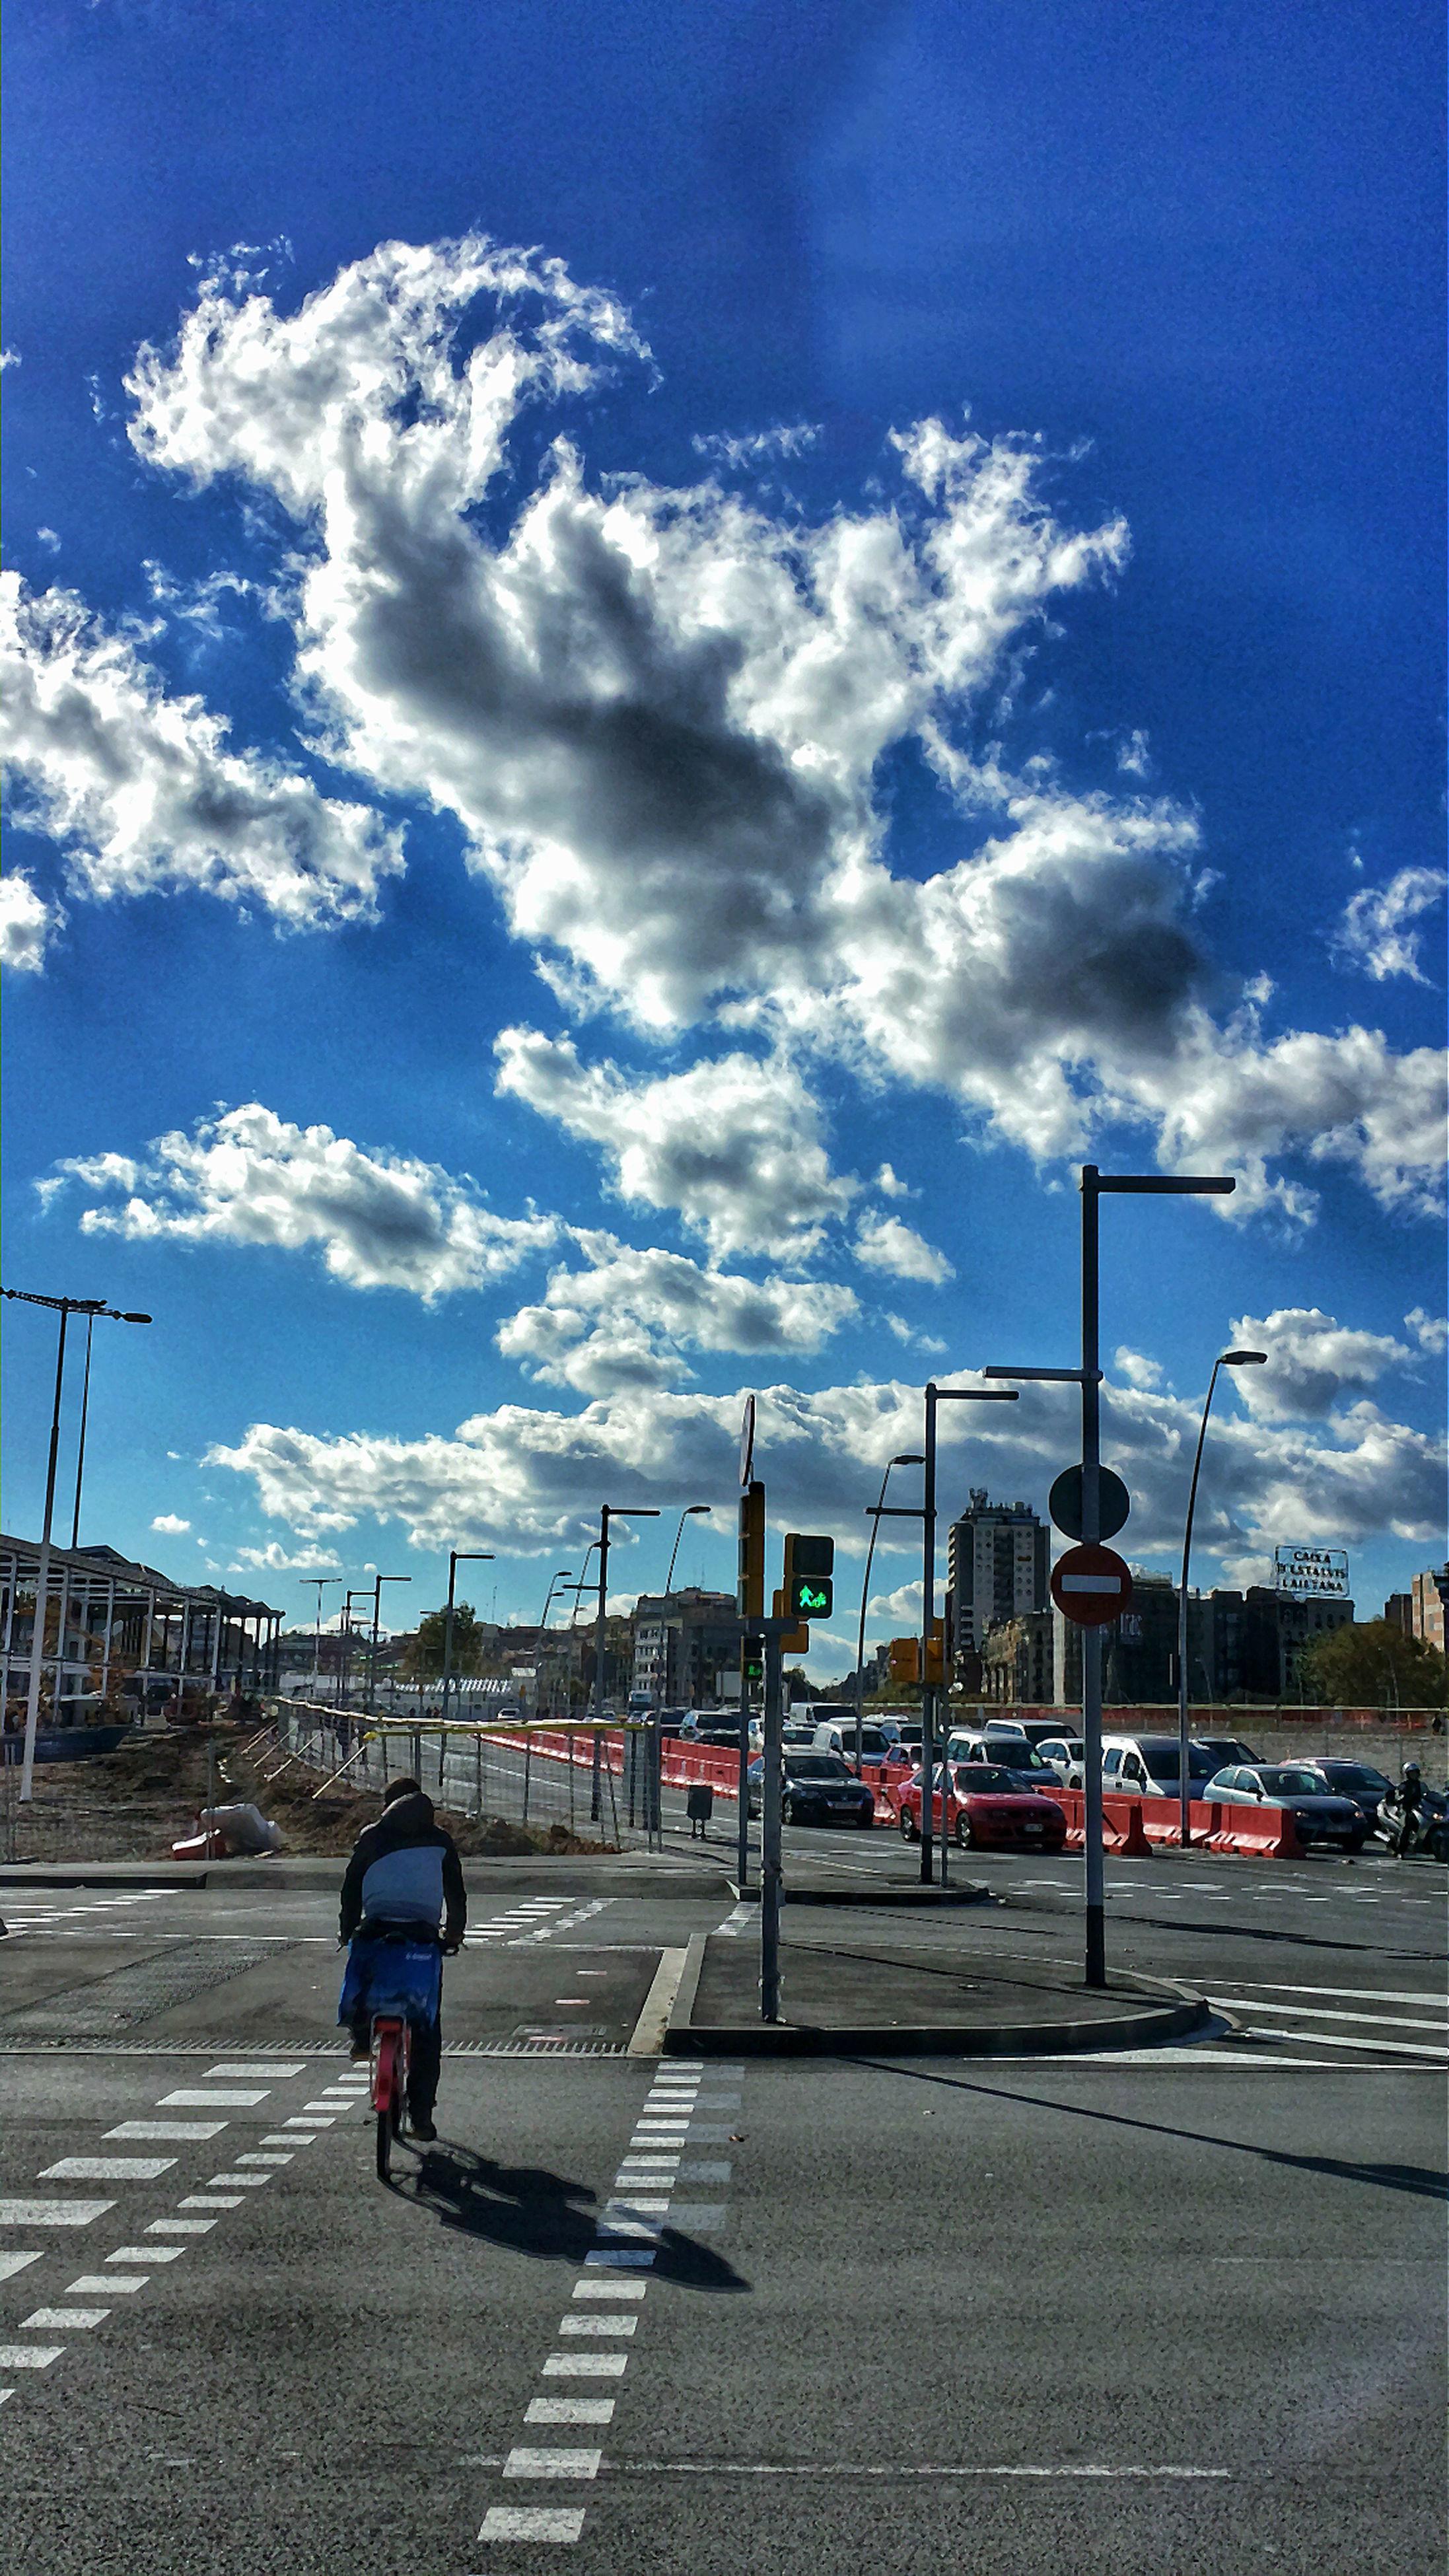 sky, transportation, street, street light, road, cloud - sky, built structure, mode of transport, blue, cloud, men, road marking, building exterior, architecture, city, car, the way forward, full length, walking